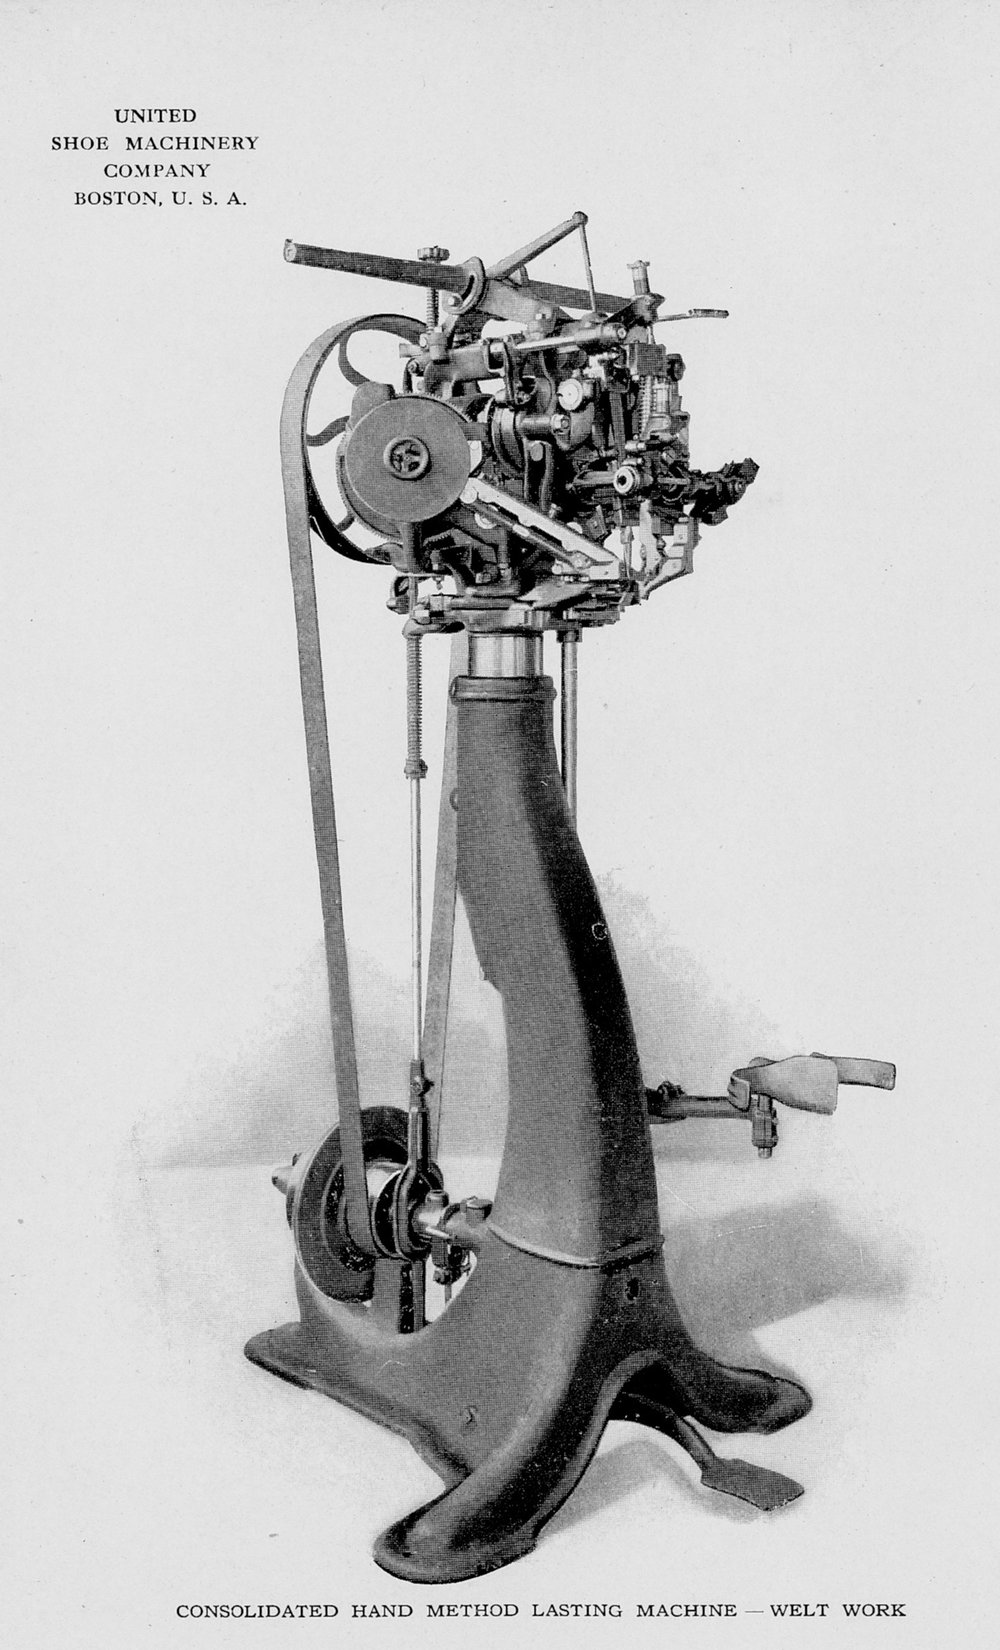 Catalog page from a USMC 1914 Catalog